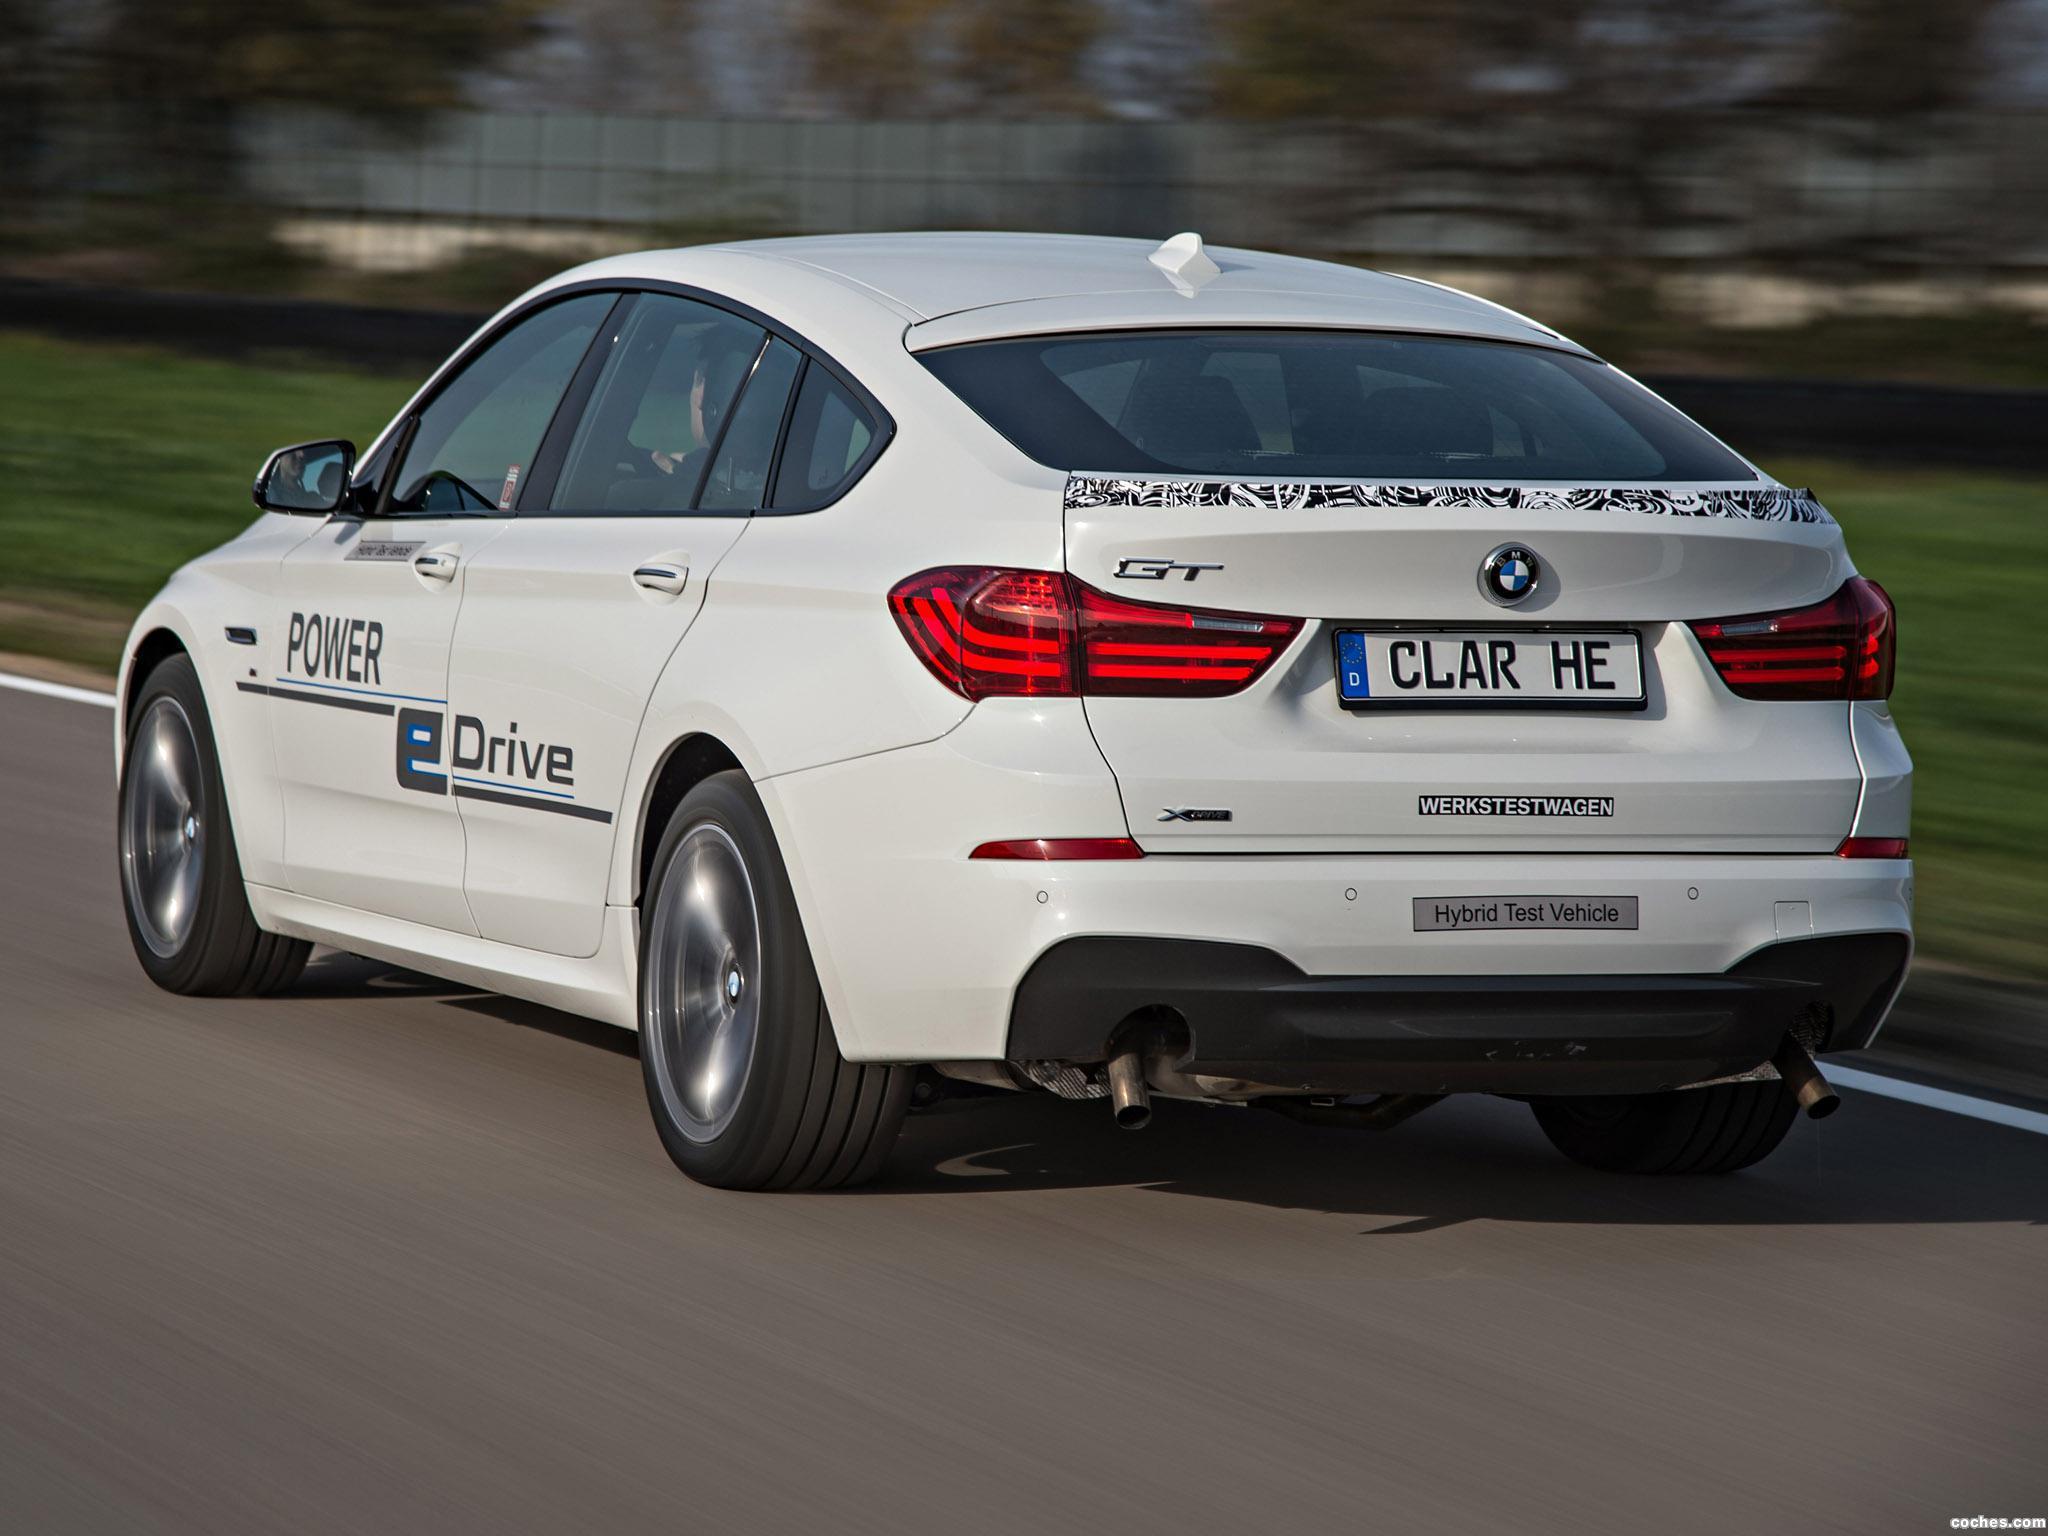 Foto 4 de BMW Serie 5 Gran Turismo Edrive Prototype 2014